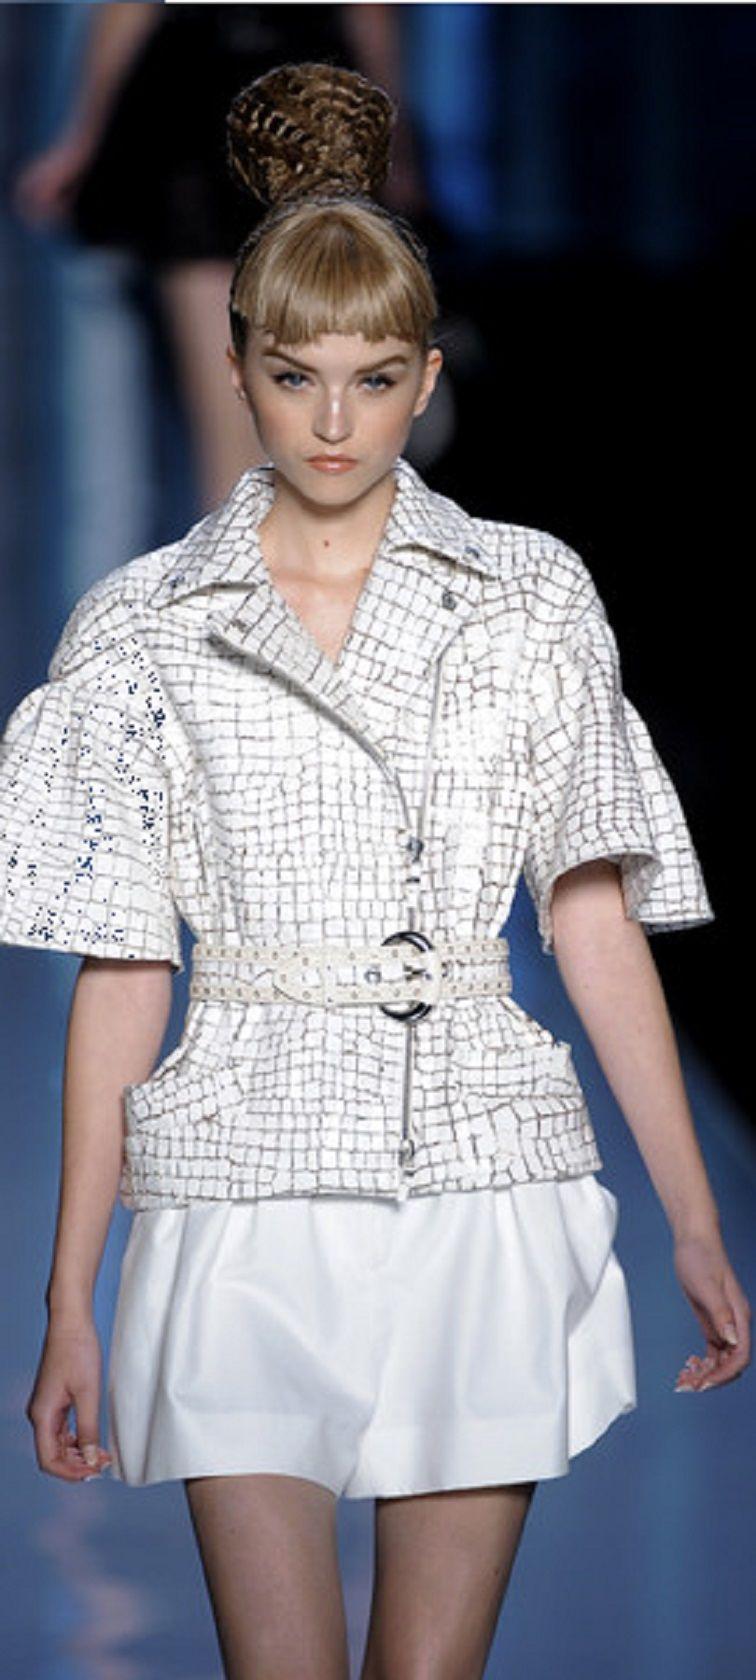 Christian Dior - spring summer 2009 - John Galliano